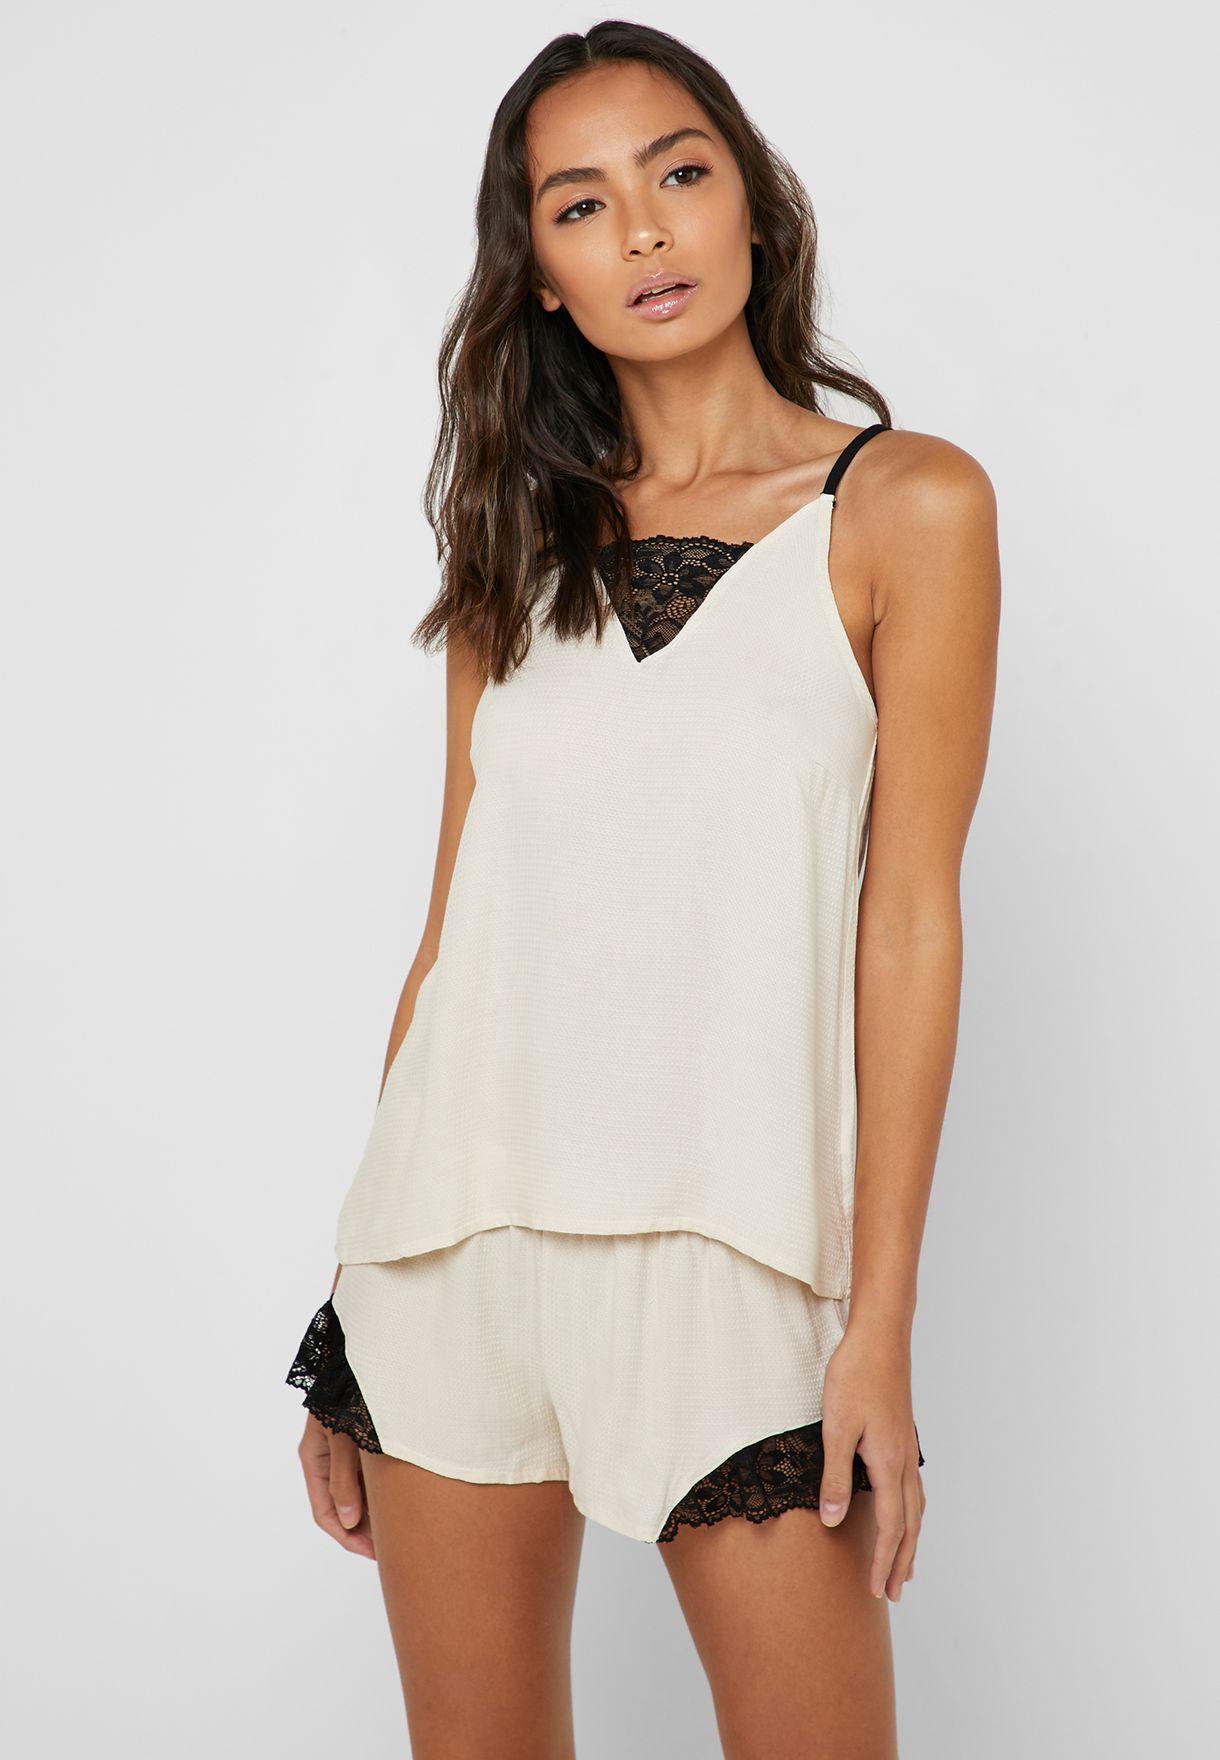 cbfb7e5159e2e5 Shop Penyemood beige Lace Insert Cami Top  amp  Shorts Pyjama Set ...